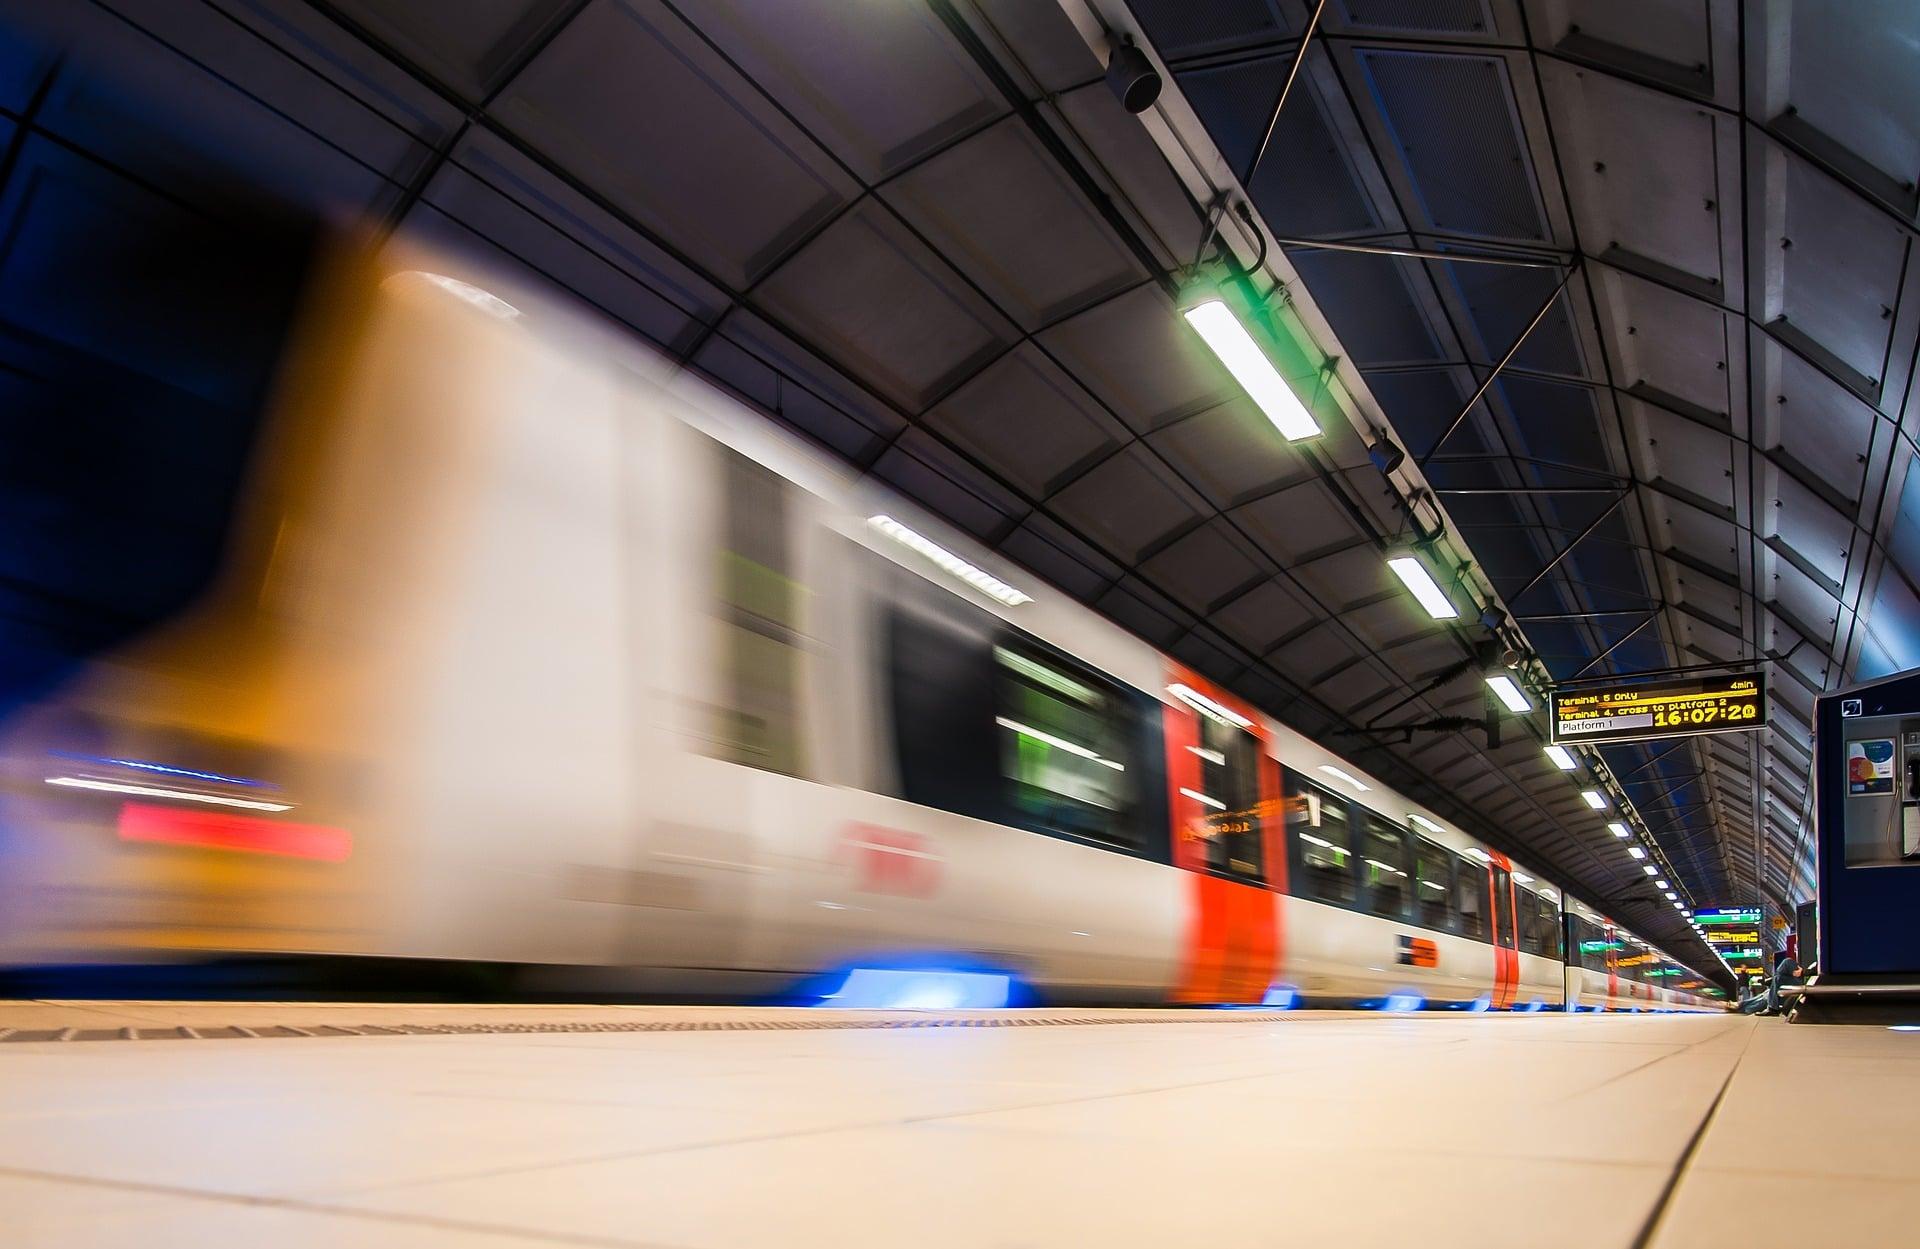 UK Government Renationalises East Coast Mainline Railway